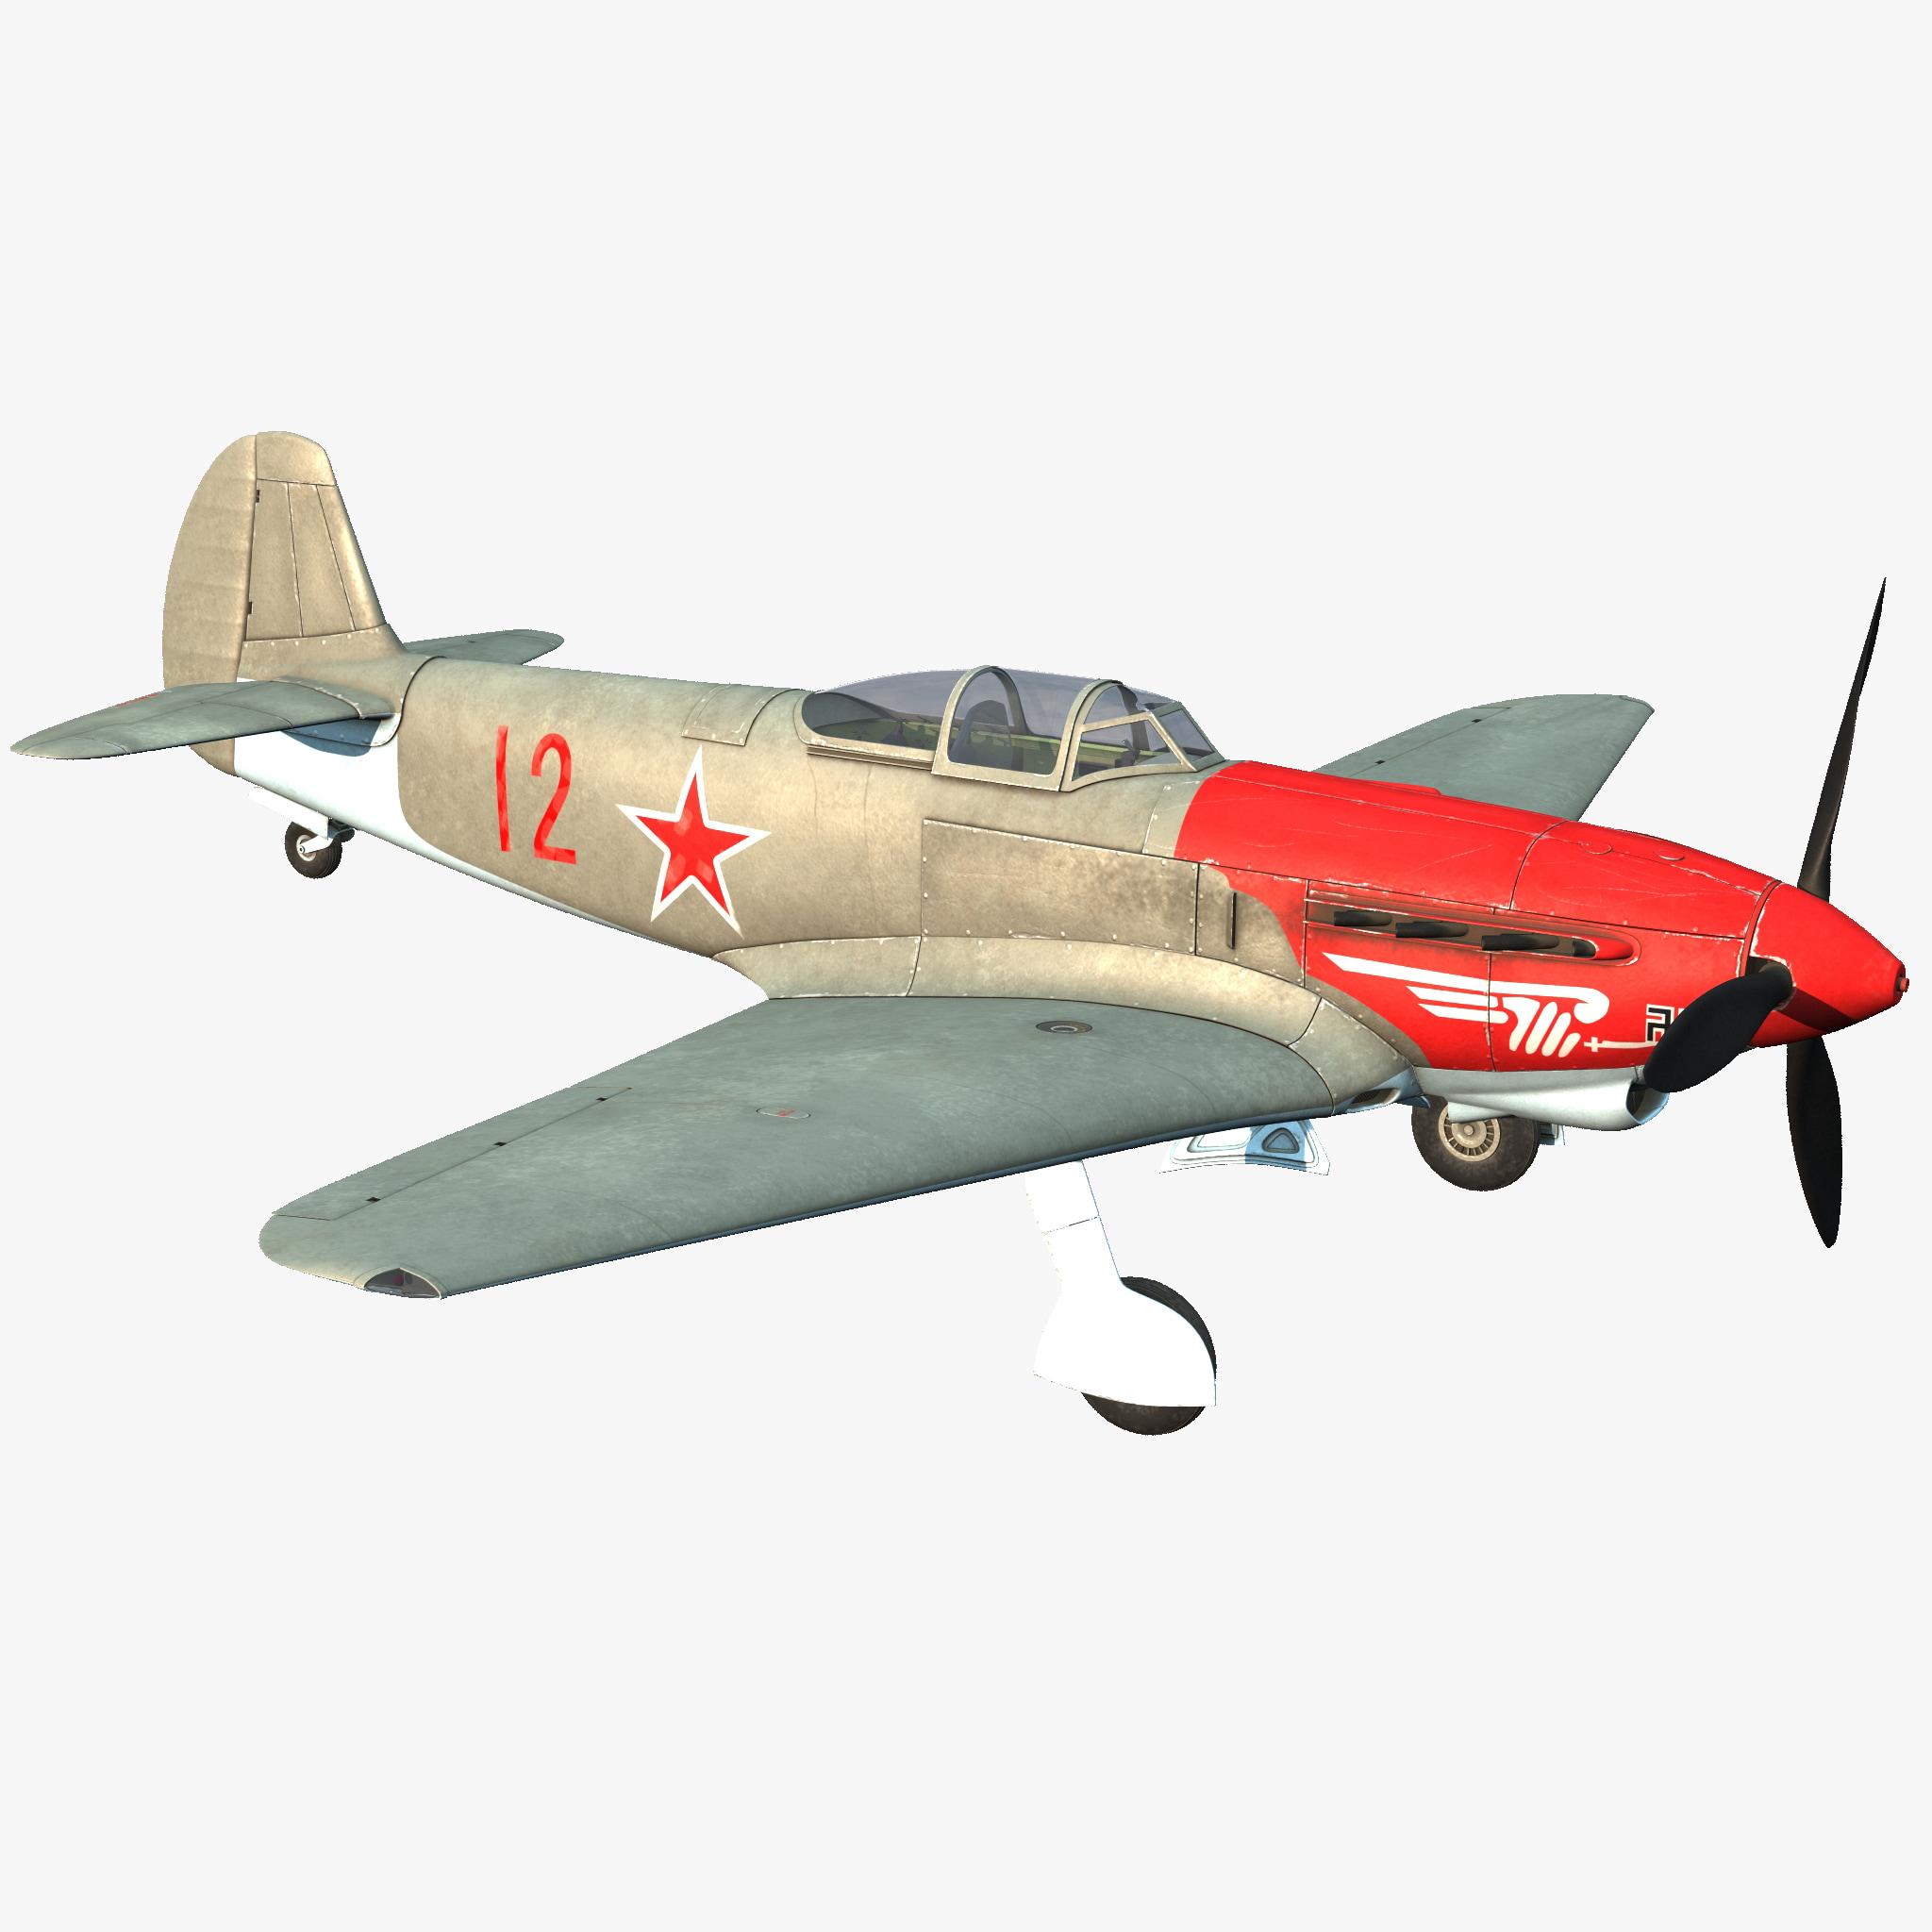 3d model of yakovlev yak-9 soviet world war